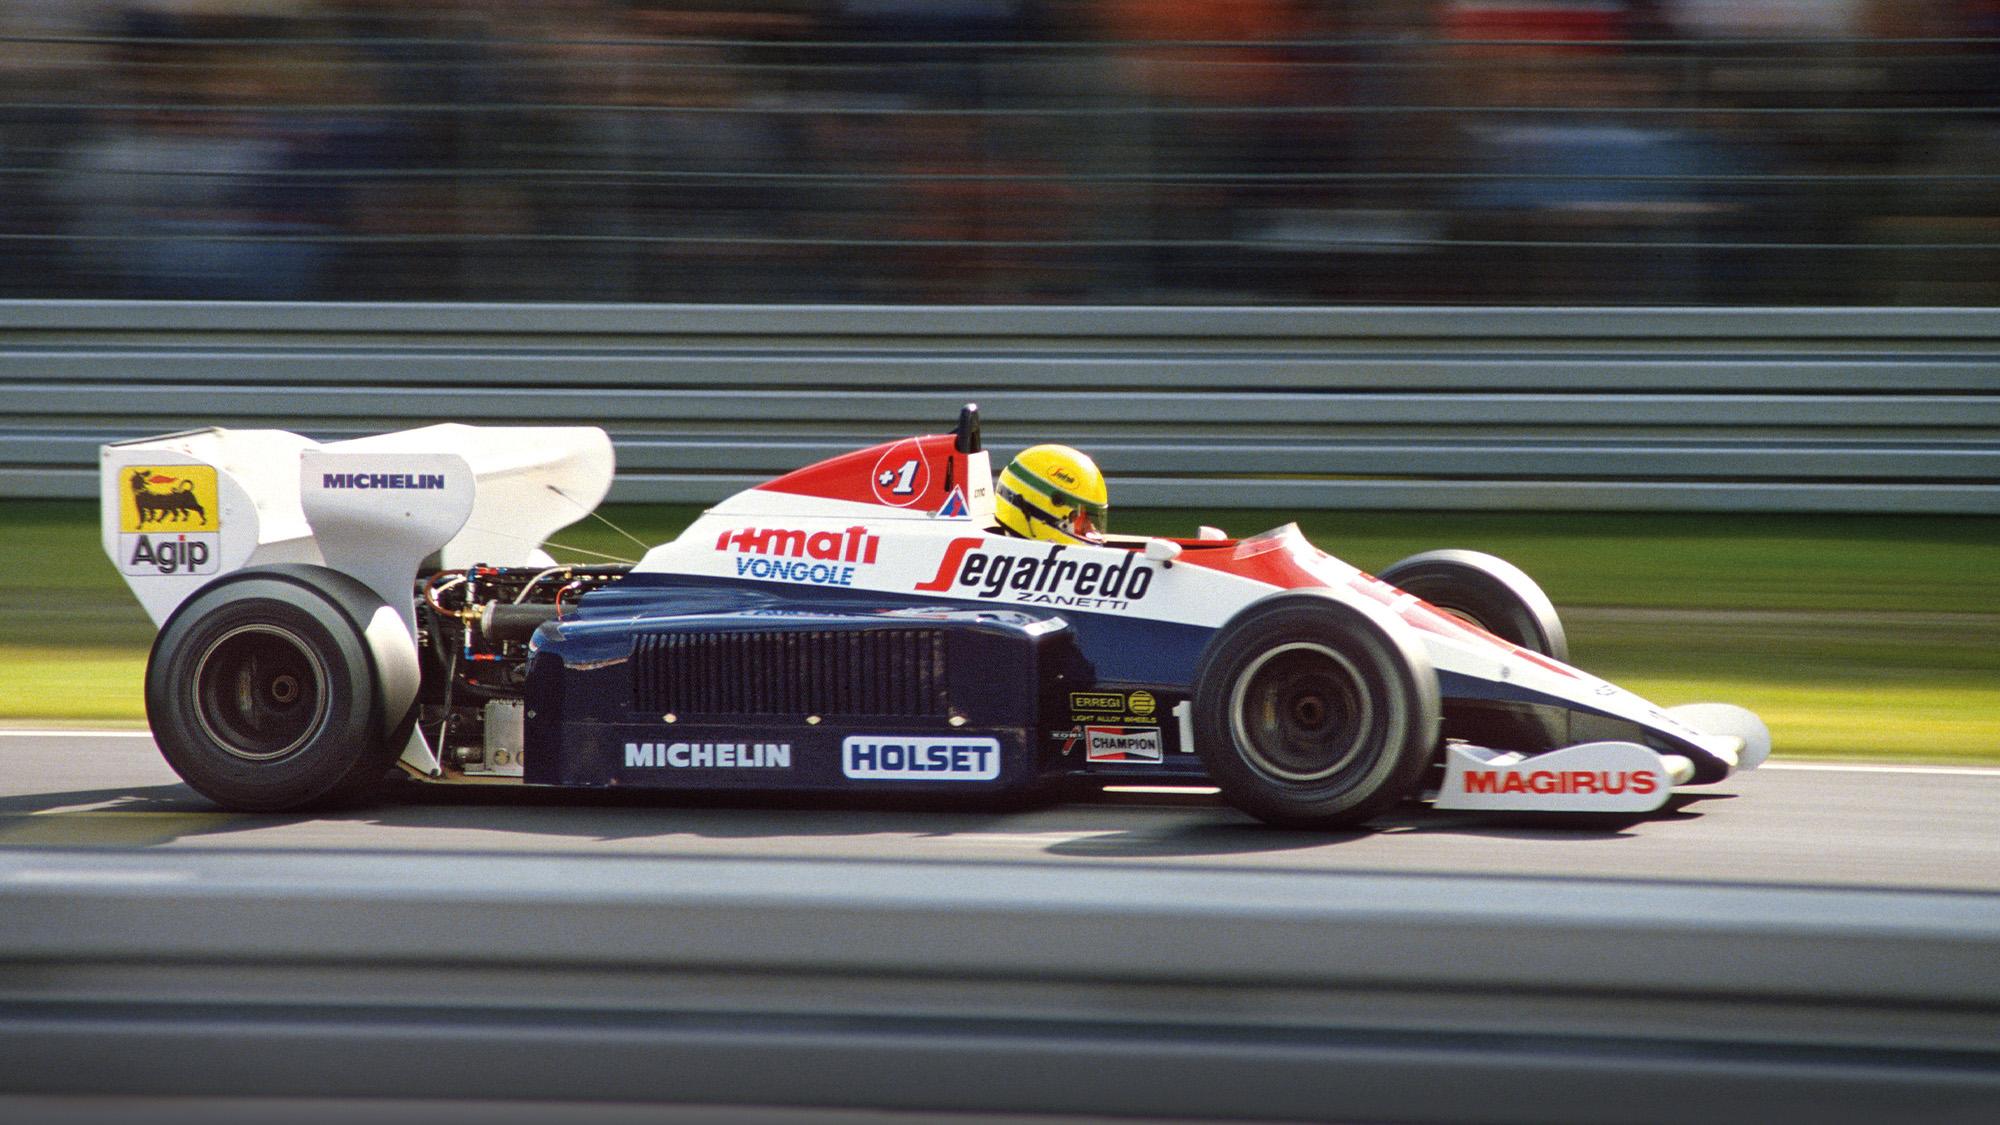 Toleman of Ayrton Senna